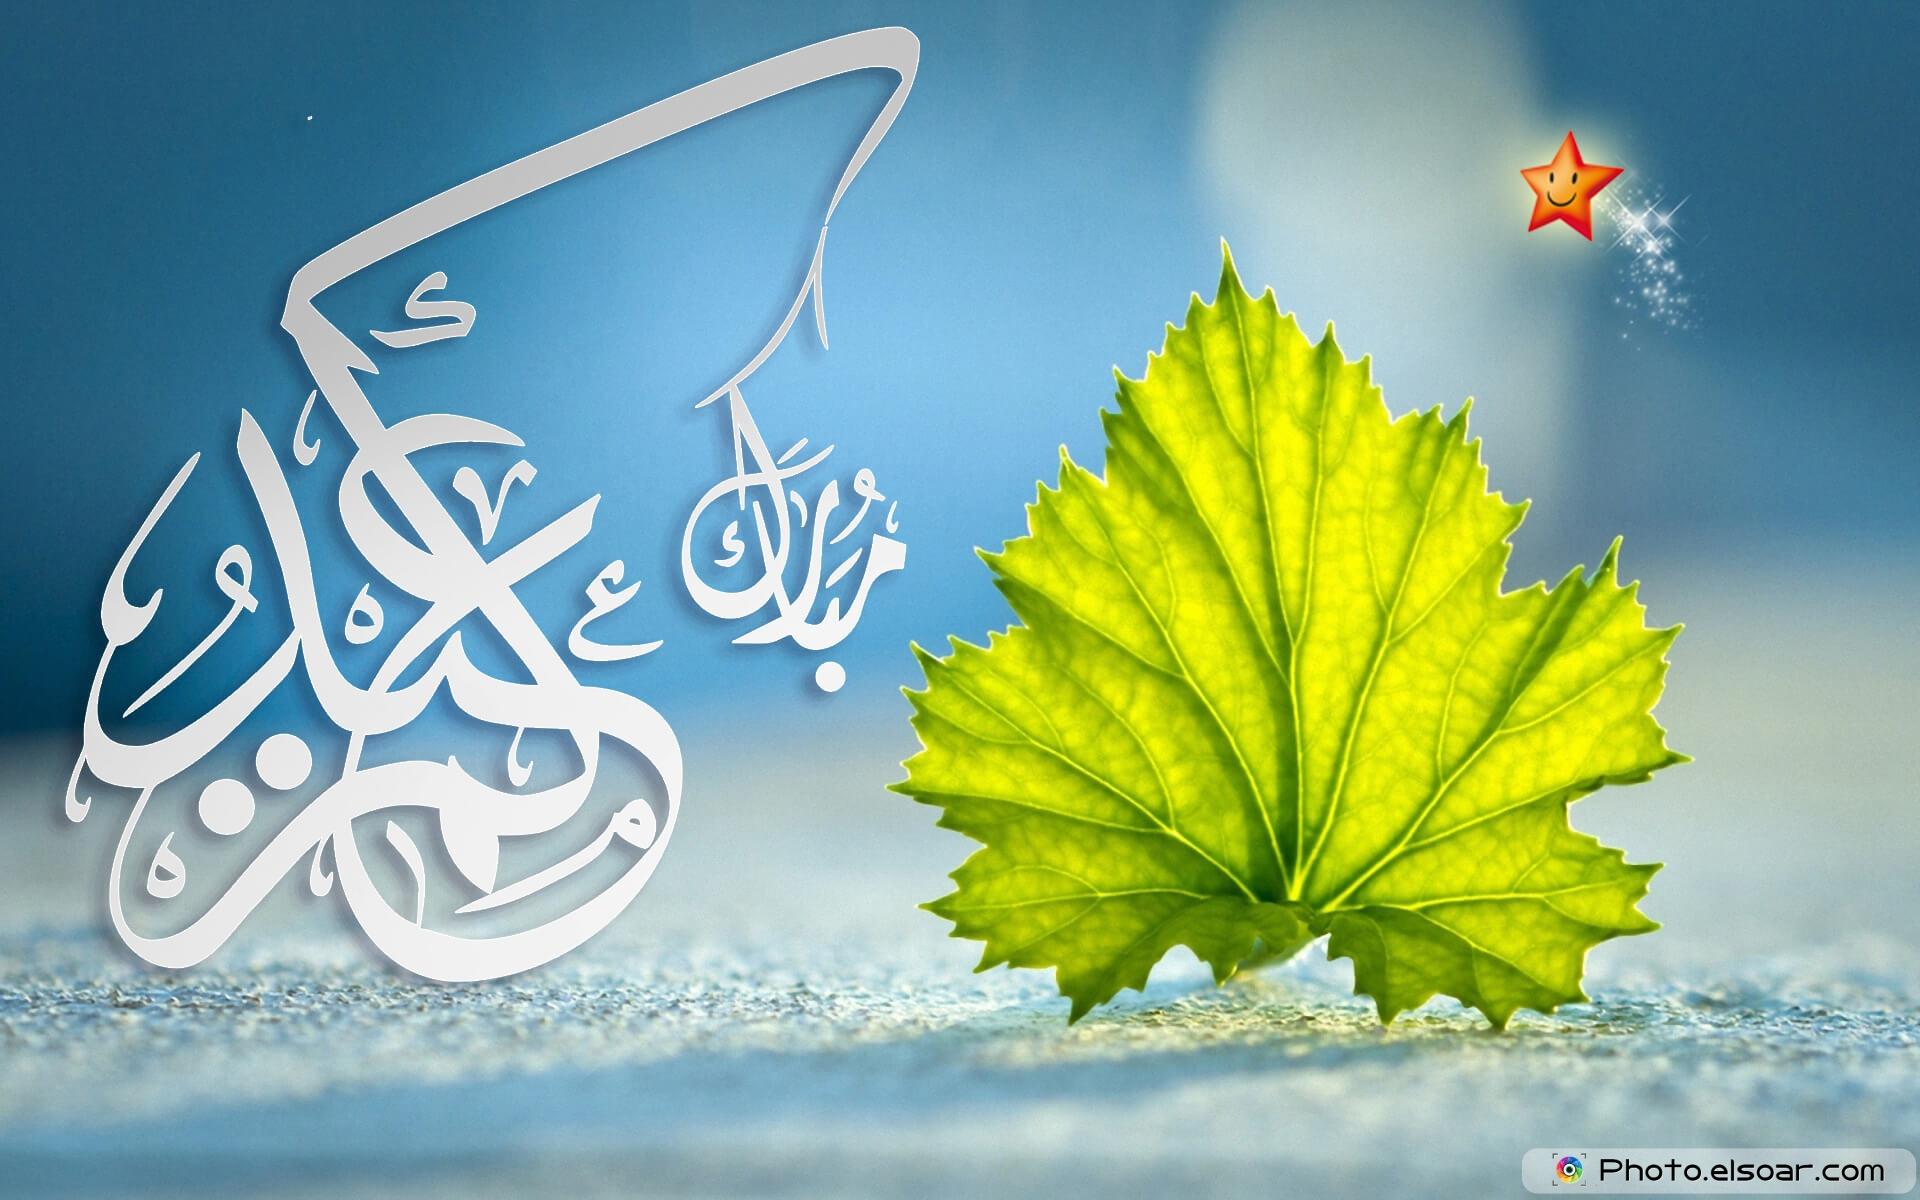 Eid Mubarak Wishes,Eid Mubarak Cards,Eid Mubarak Pictures,Eid Mubarak Greetings,Eid Mubarak Messages,Eid Mubarak Wallpaper